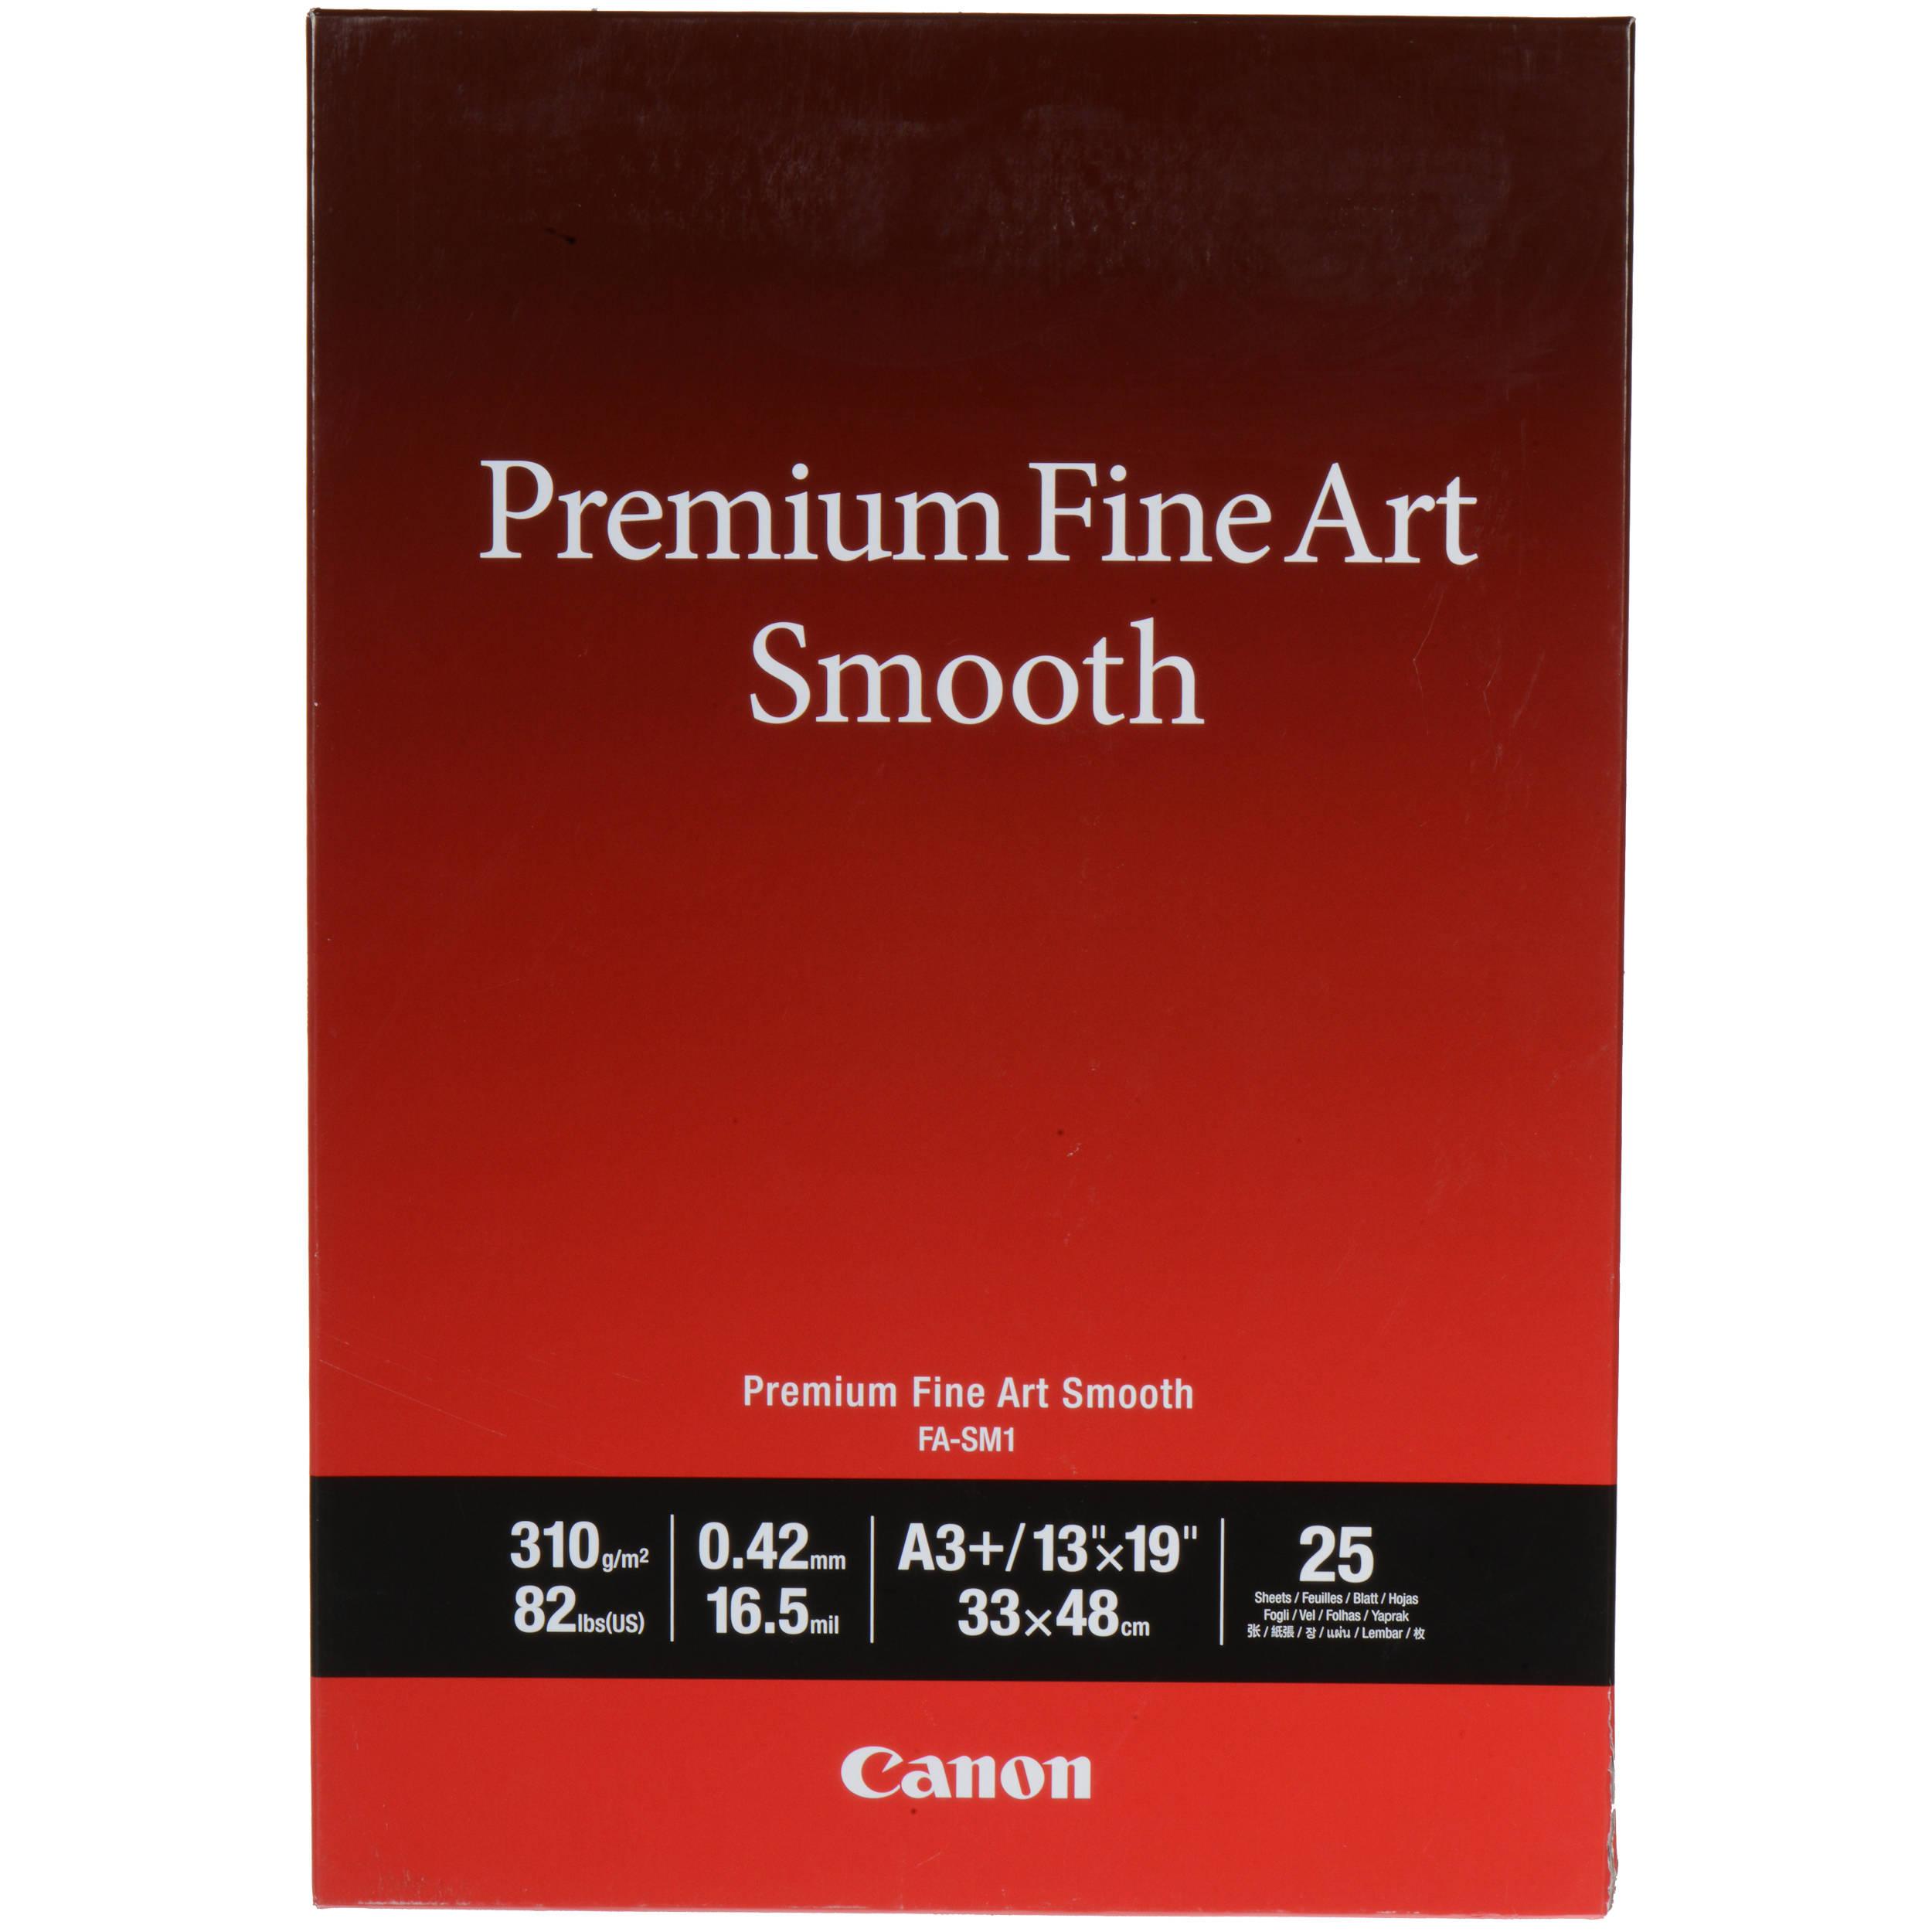 A3+ FA-SM1 FineArt Premium Smooth (25)